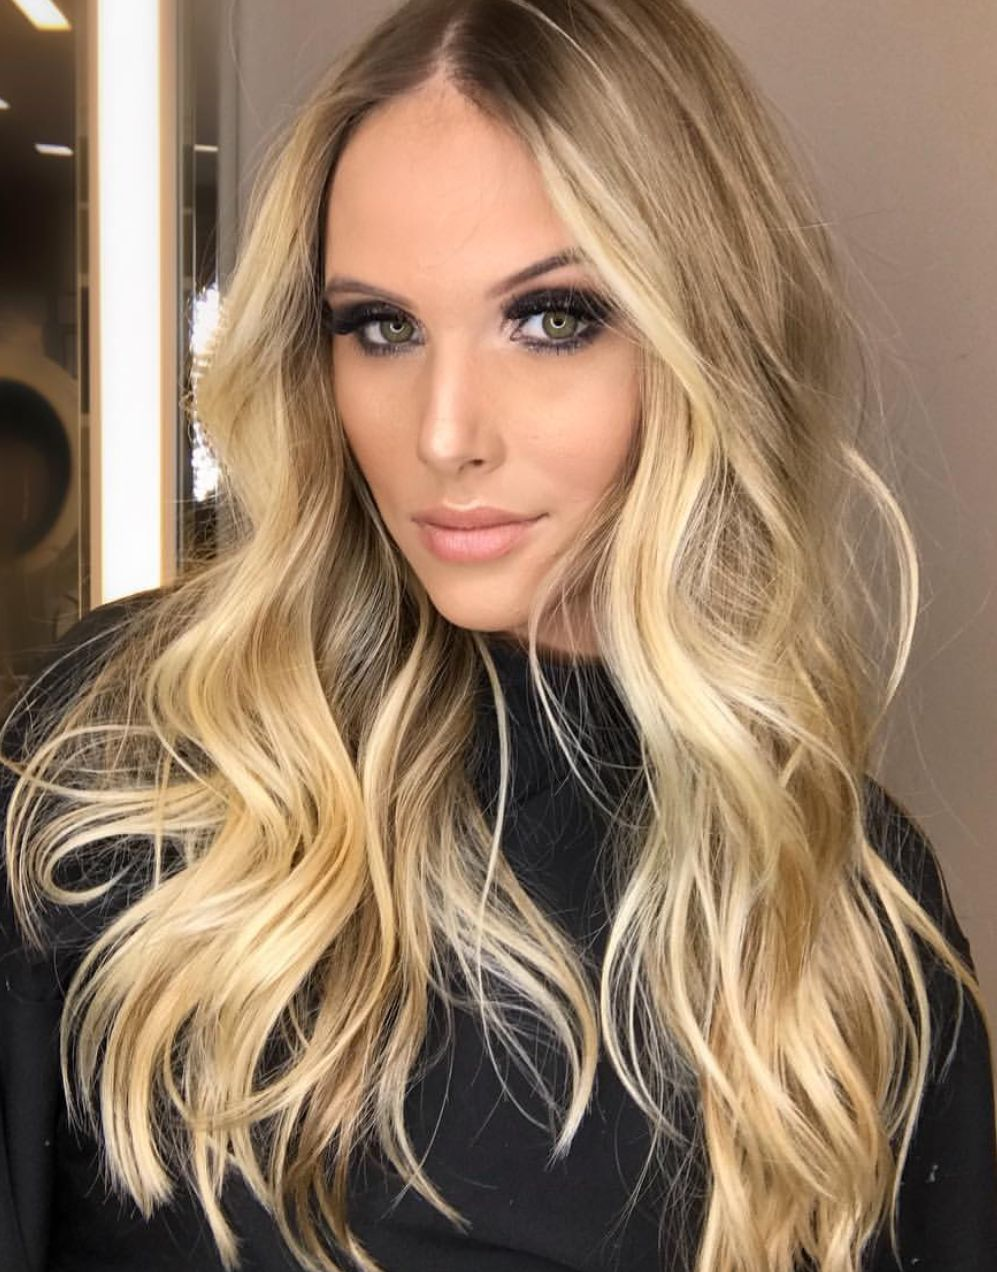 pinterest deborahpraha long hair with curls and balayage blonde hair color shades cortescabellocolores de pelo rubiocortes - Cortes De Pelo Rubio